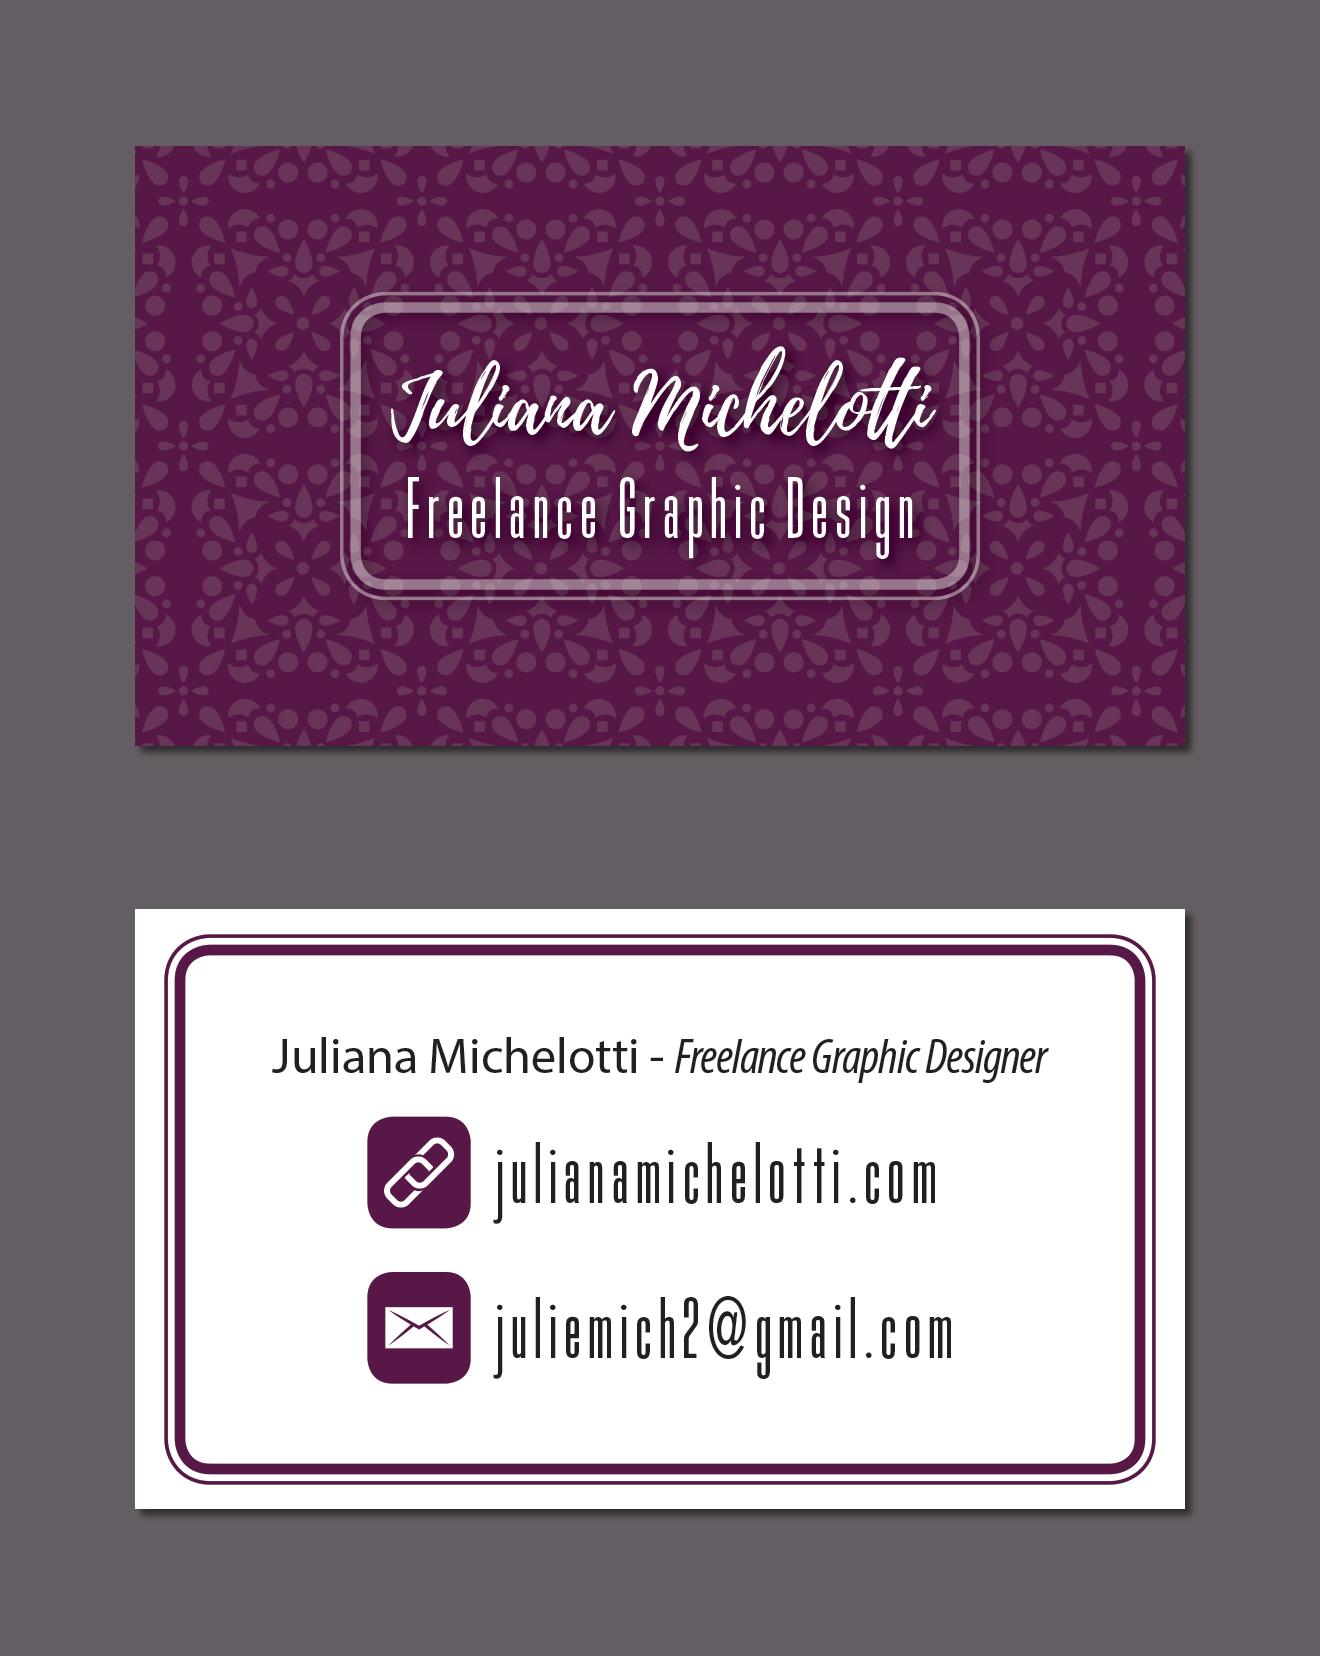 Juliana Michelotti - Personal Business Card